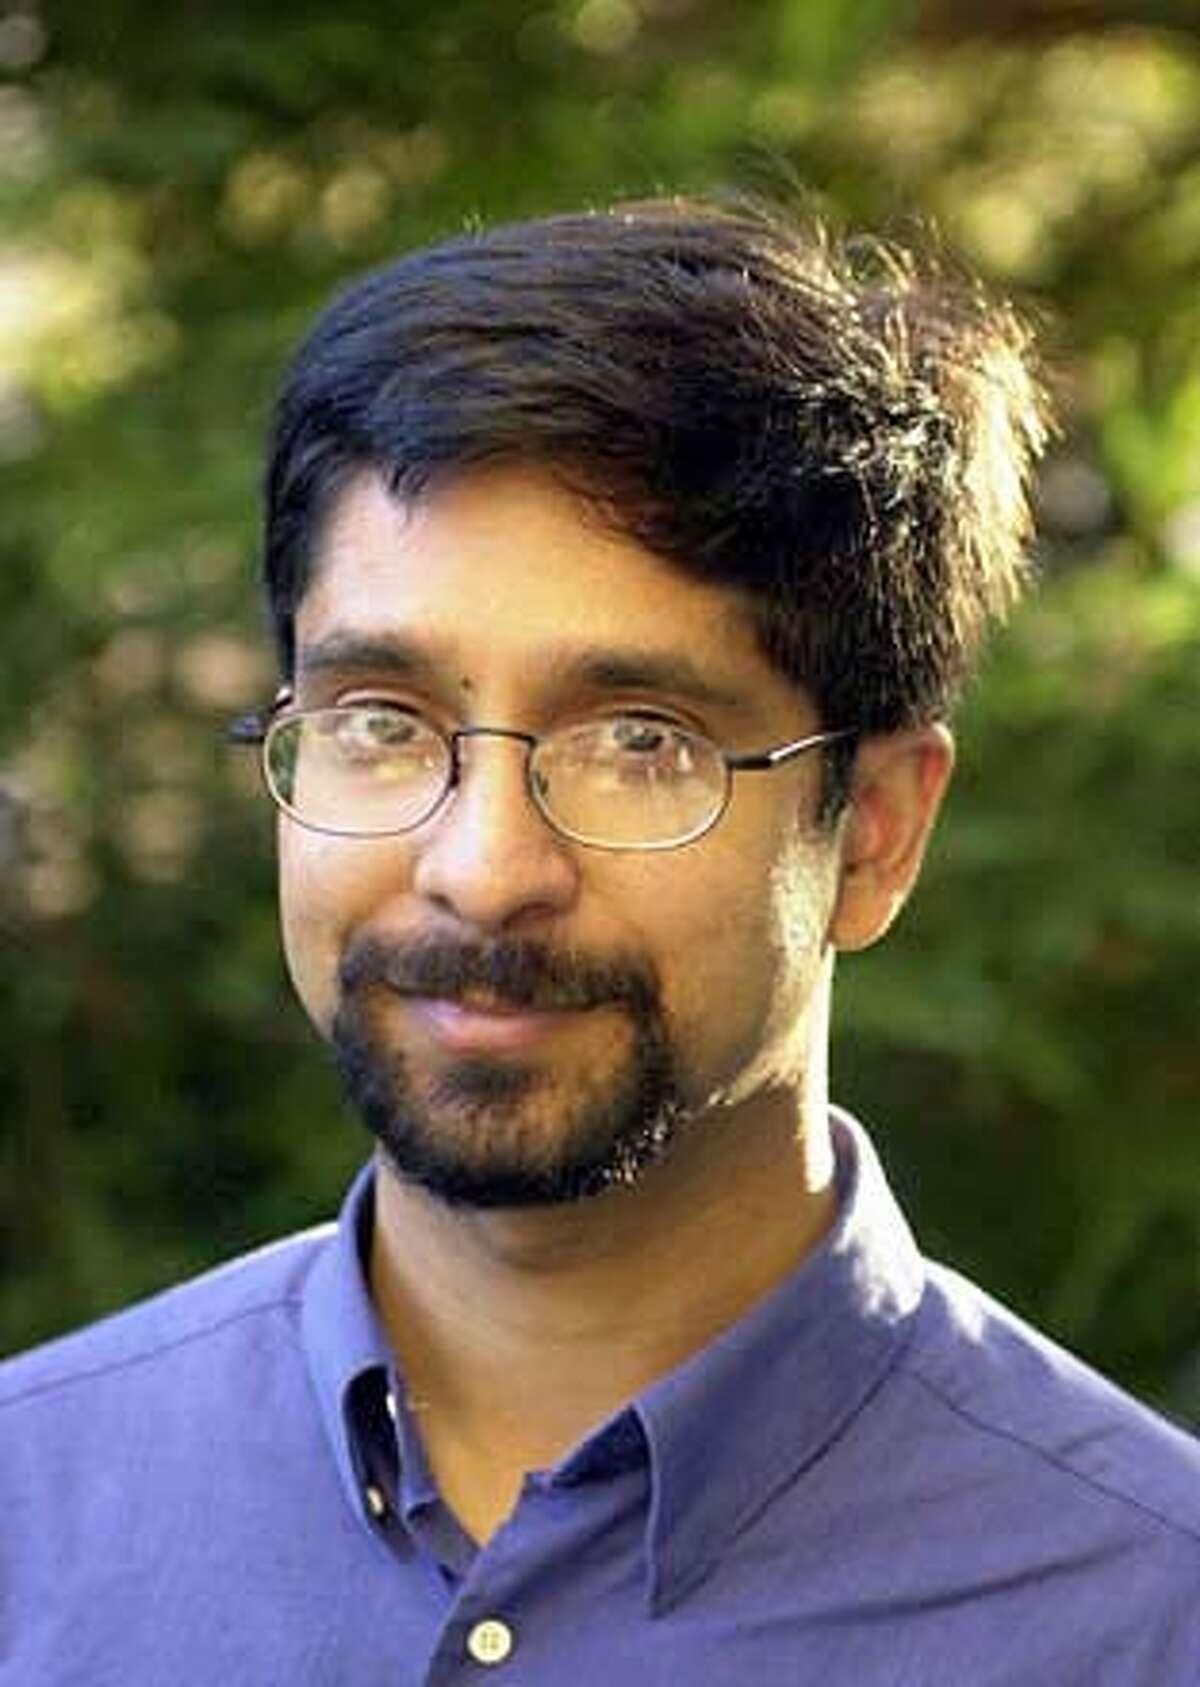 Photo of Vijay Pande to go with a story slugged PLAYSTATION15 running tomorrow.